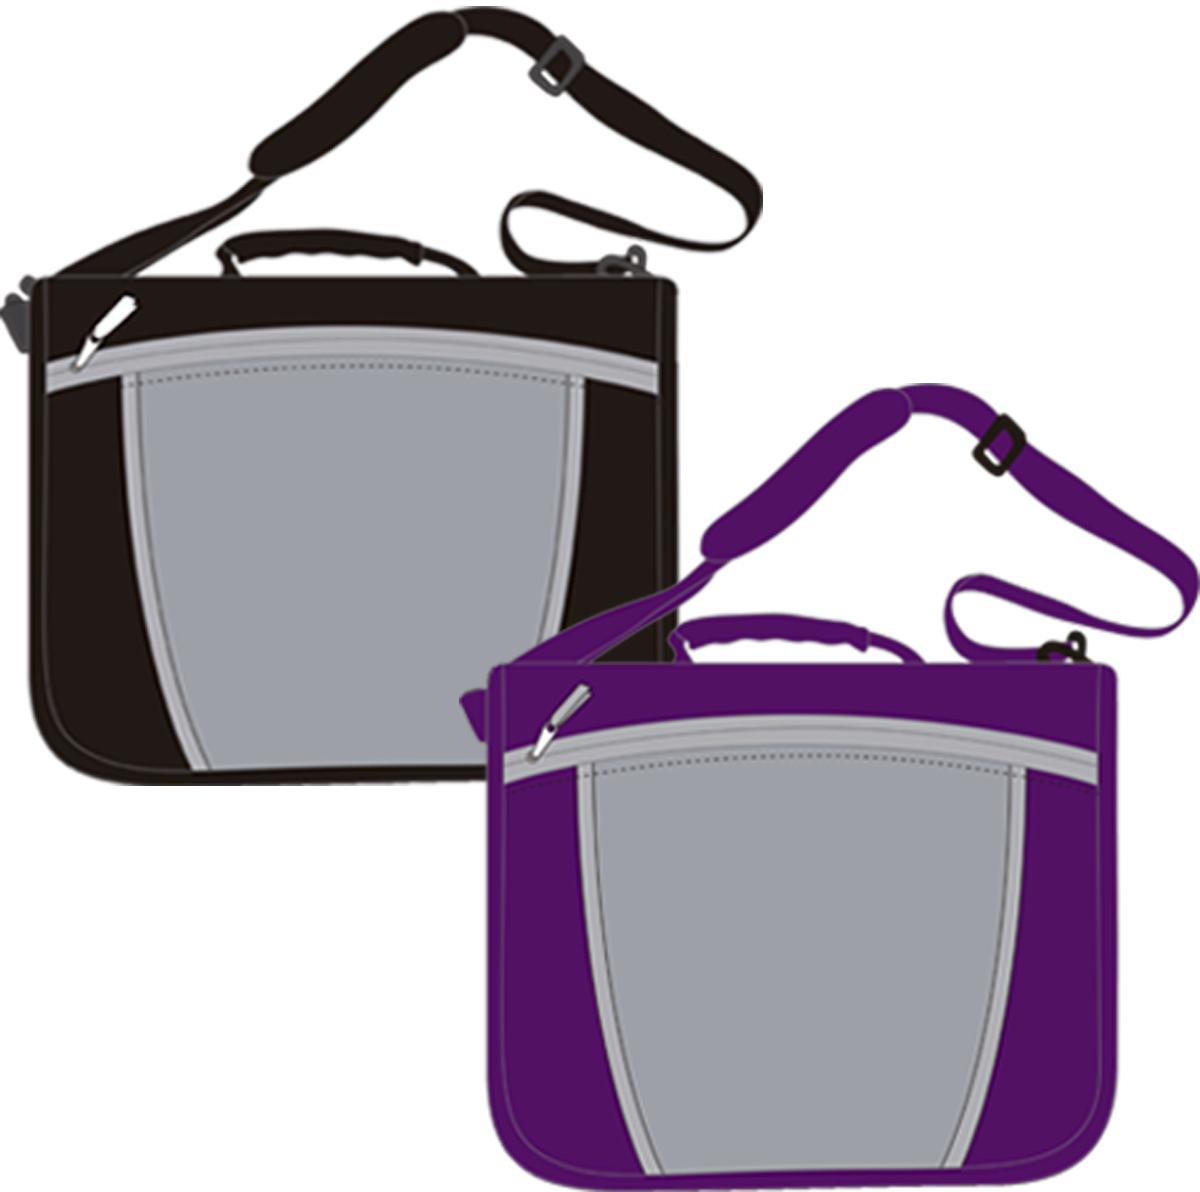 wholesale 1 5 quot 3 ring zipper carry bag binder sku 2267506